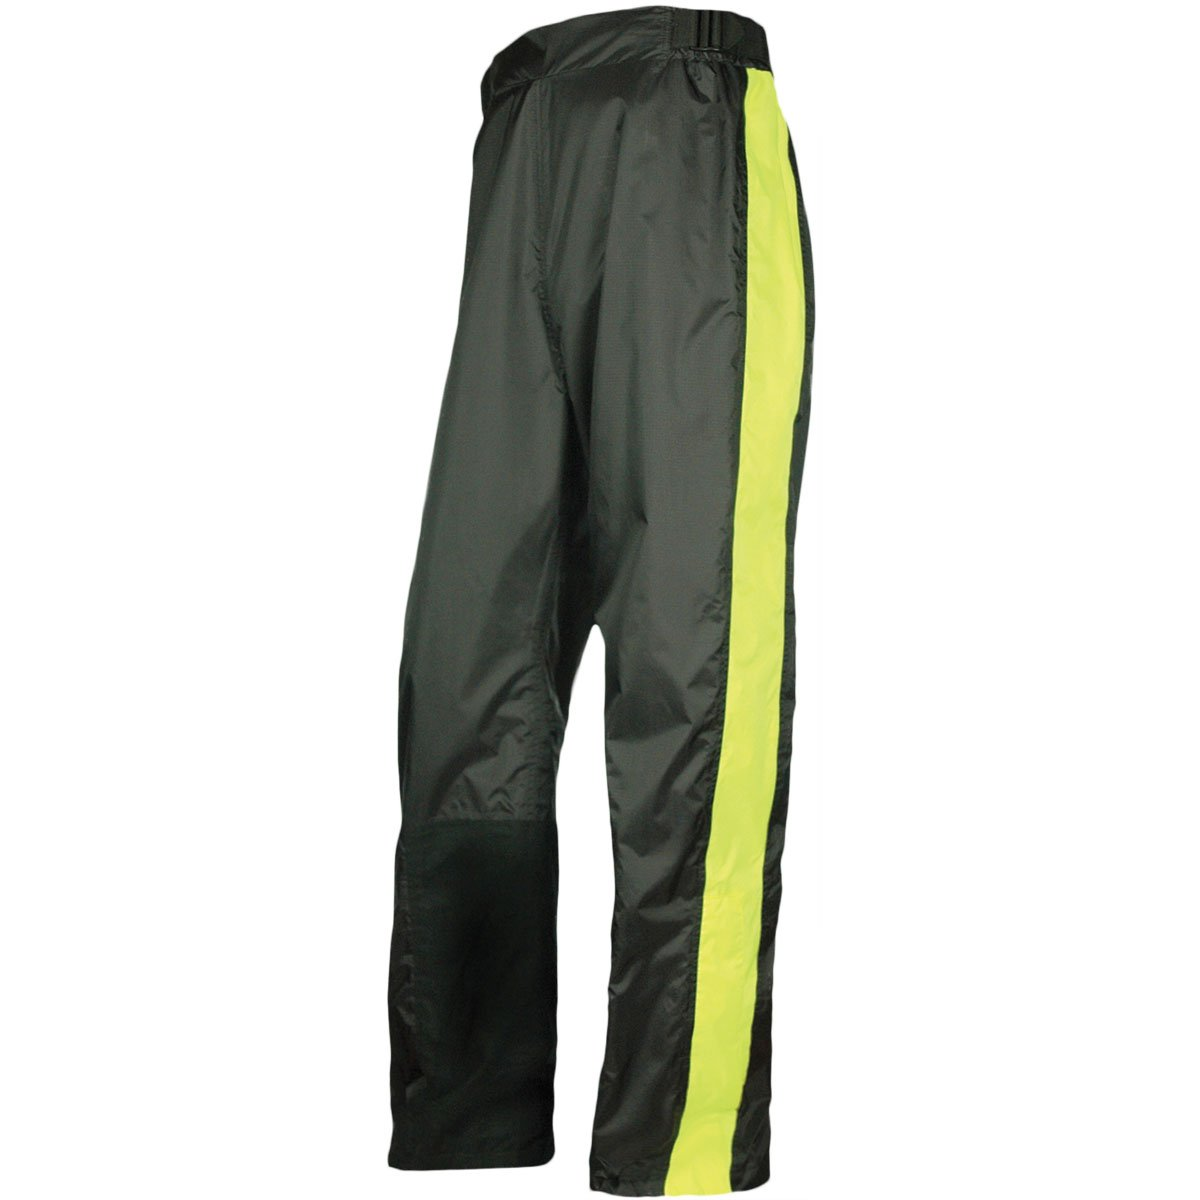 Olympia Horizon Adult Rain Pant Street Motorcycle Rain Suit - Black/Neon Yellow/X-Large/2X-Large